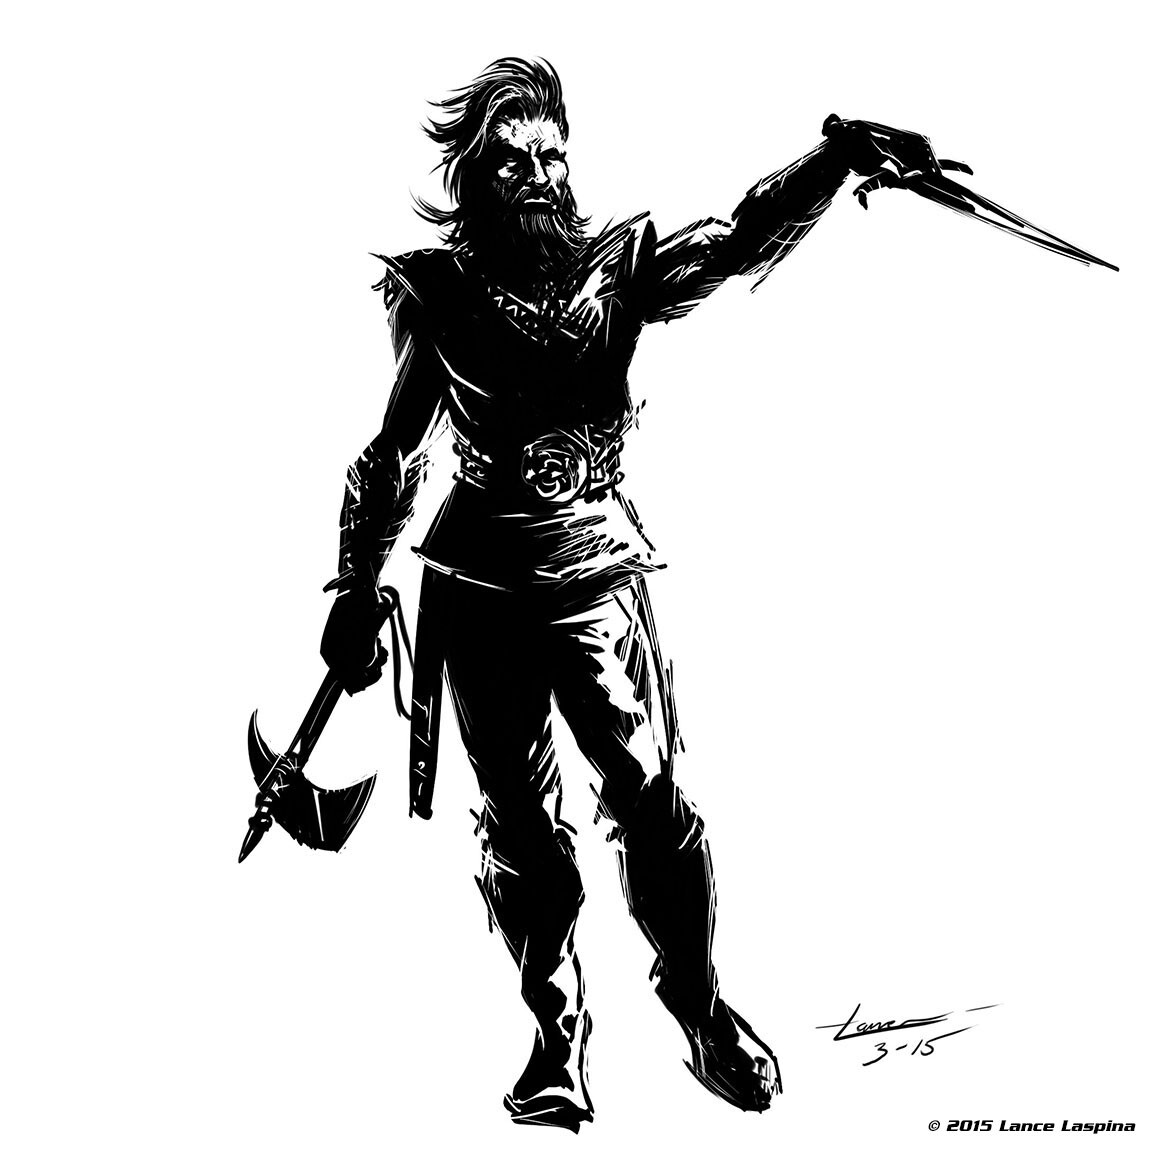 Lance laspina vikingwithdagger